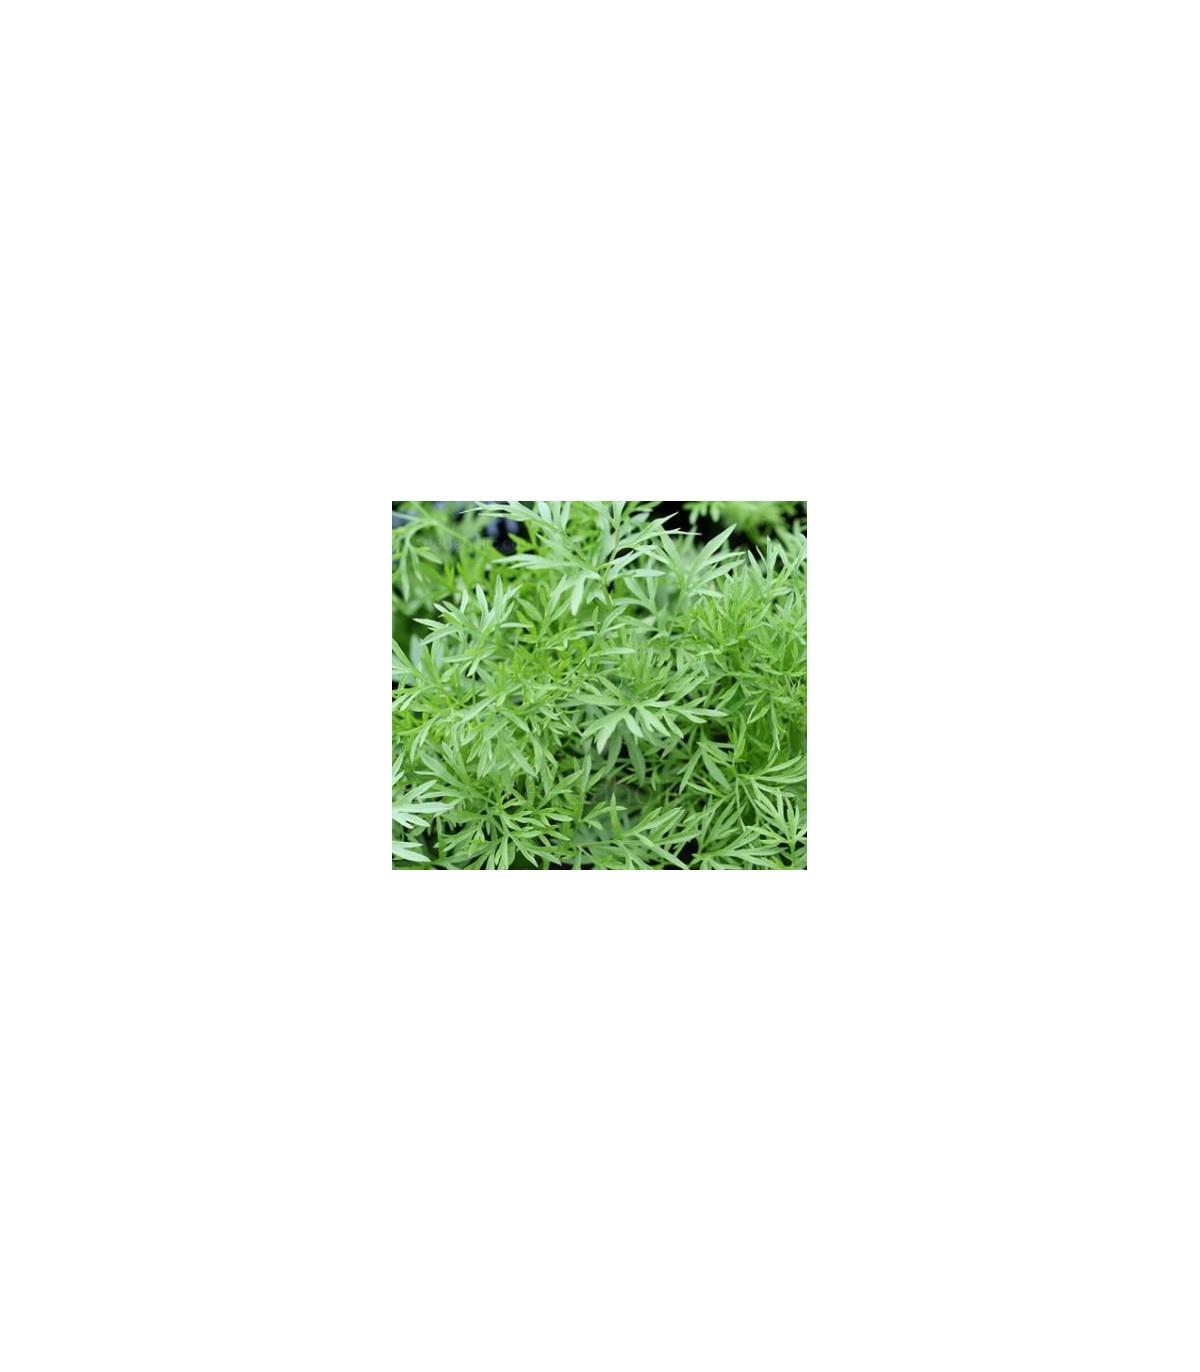 Koriander siaty Confetti - Coriandrum sativum - semená koriandra - 0,9 g